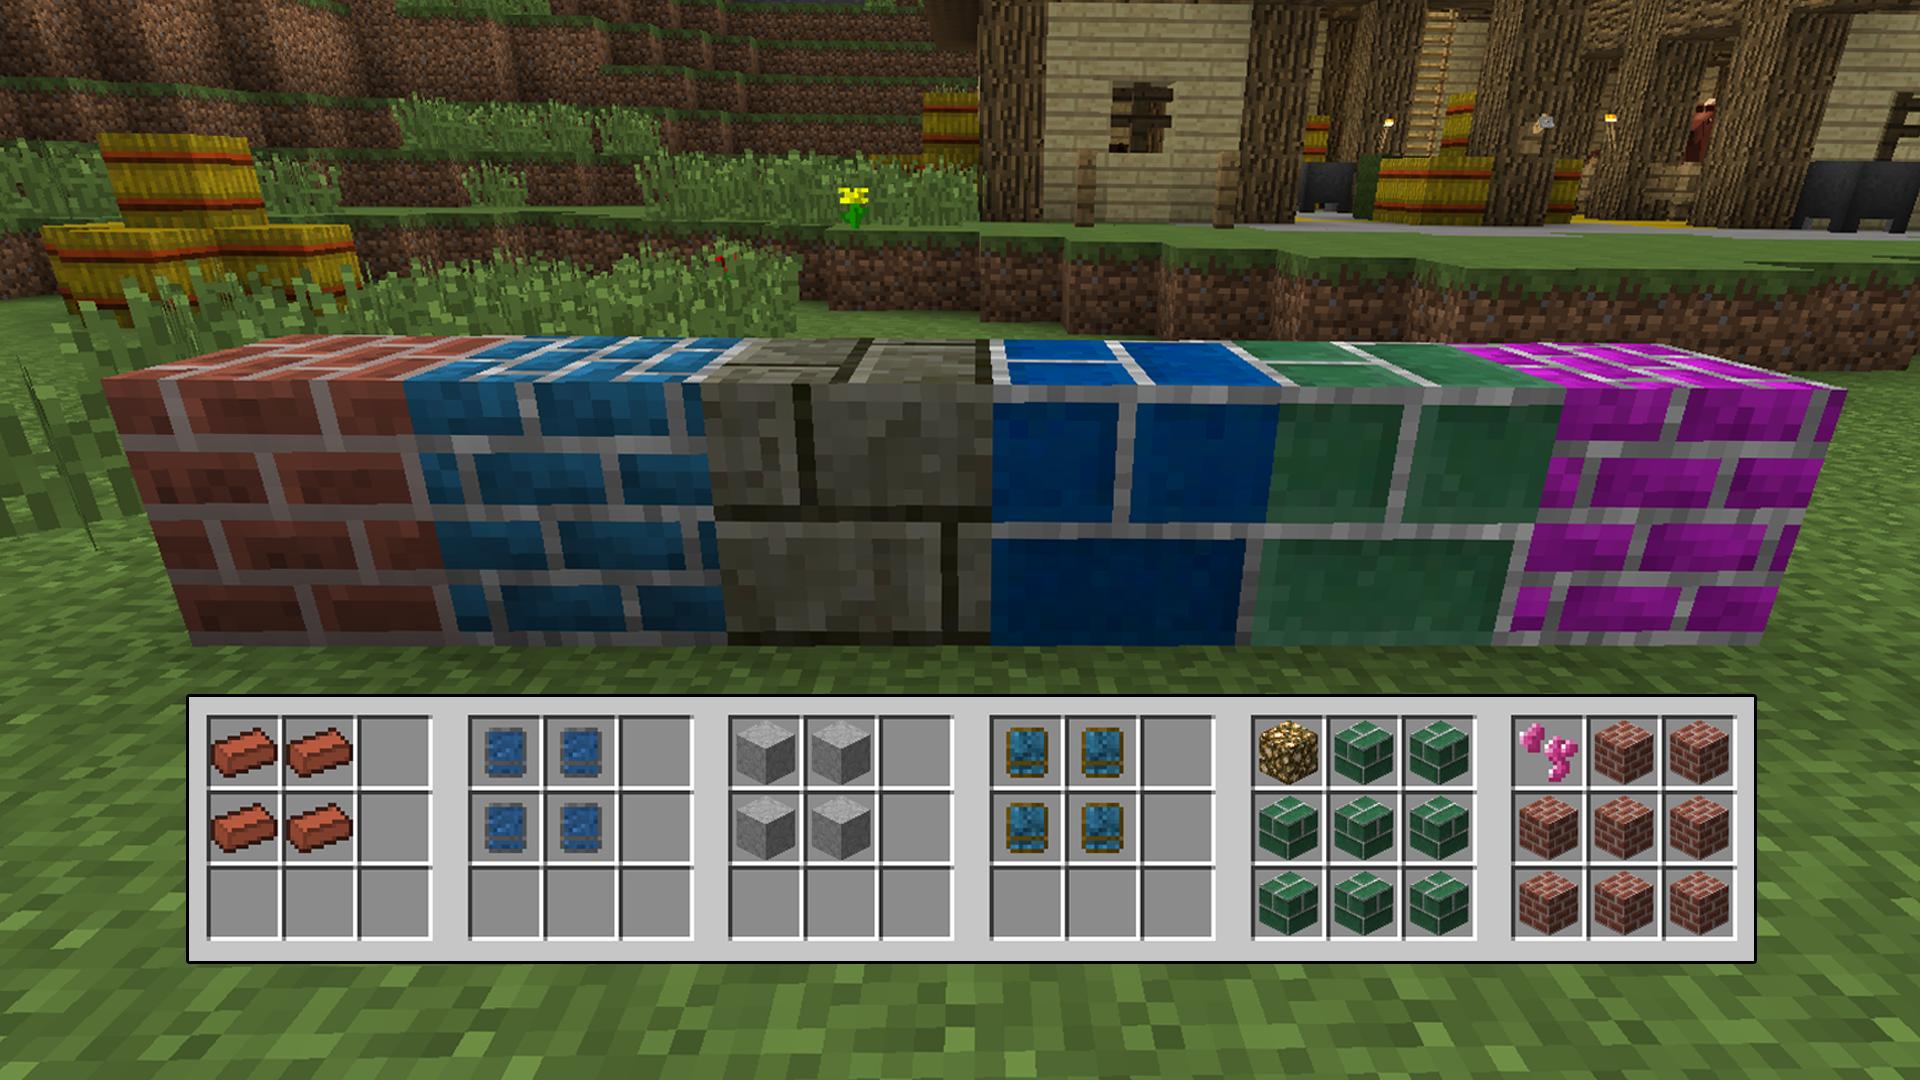 How Do You Make Clay Bricks : Gwycraft minecraft mods